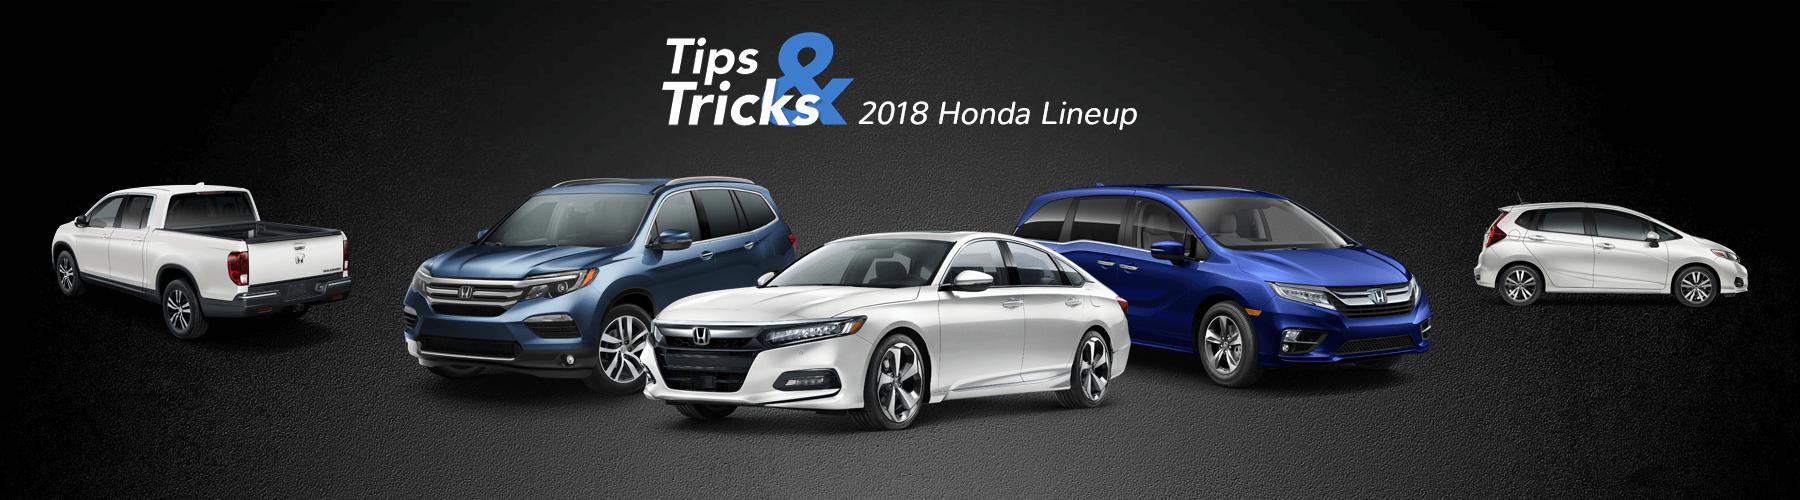 2018 Honda Tips and Tricks Banner